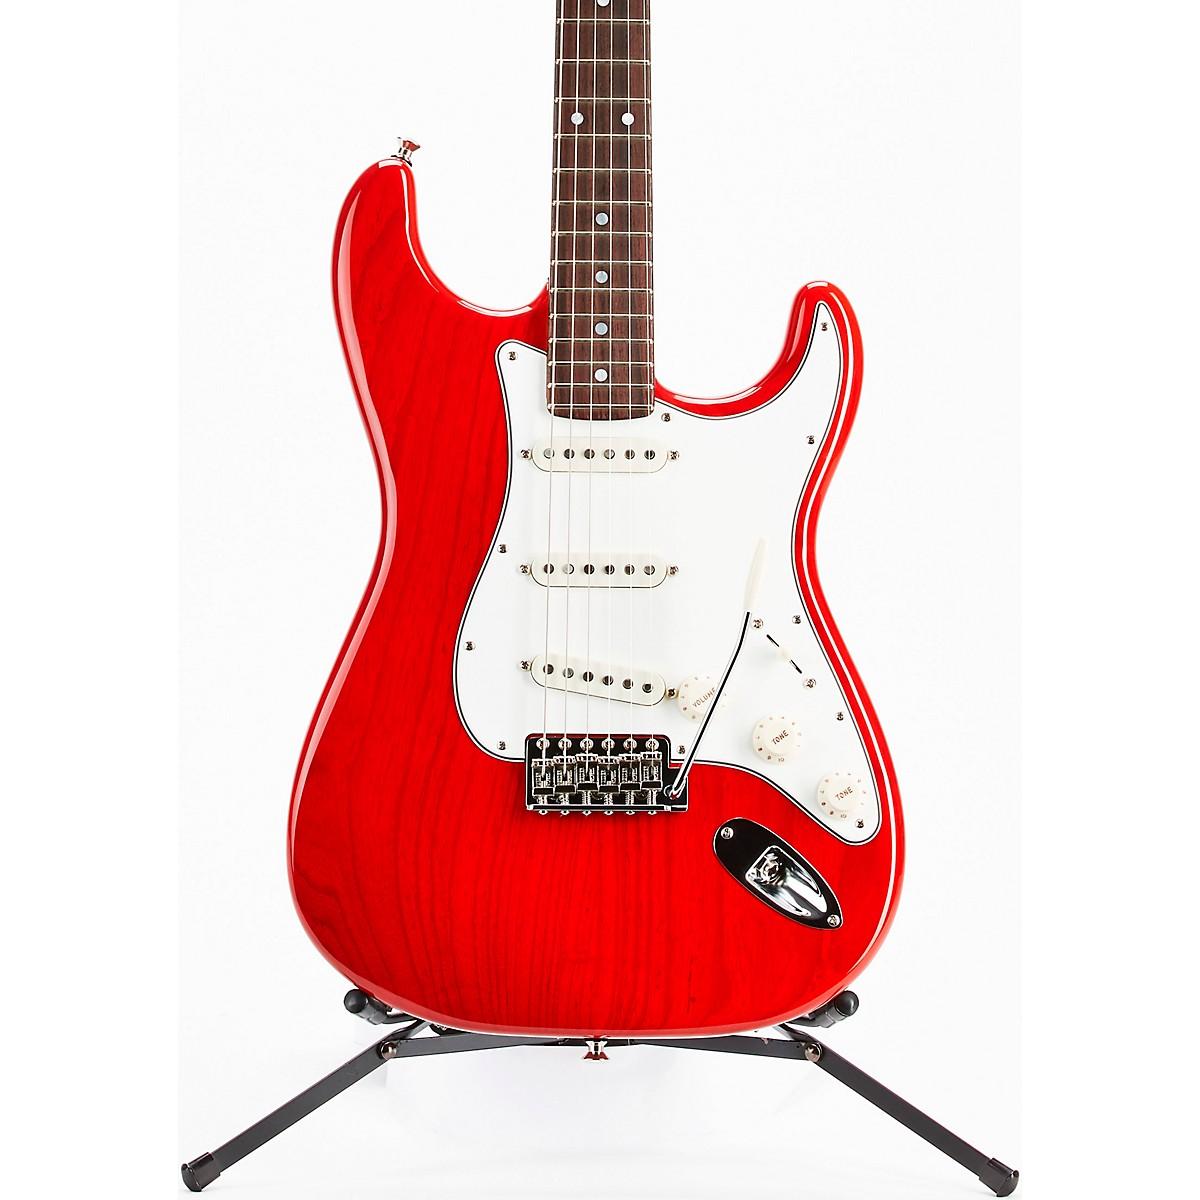 Fender Custom Shop American Custom Stratocaster Rosewood Fingerboard Electric Guitar